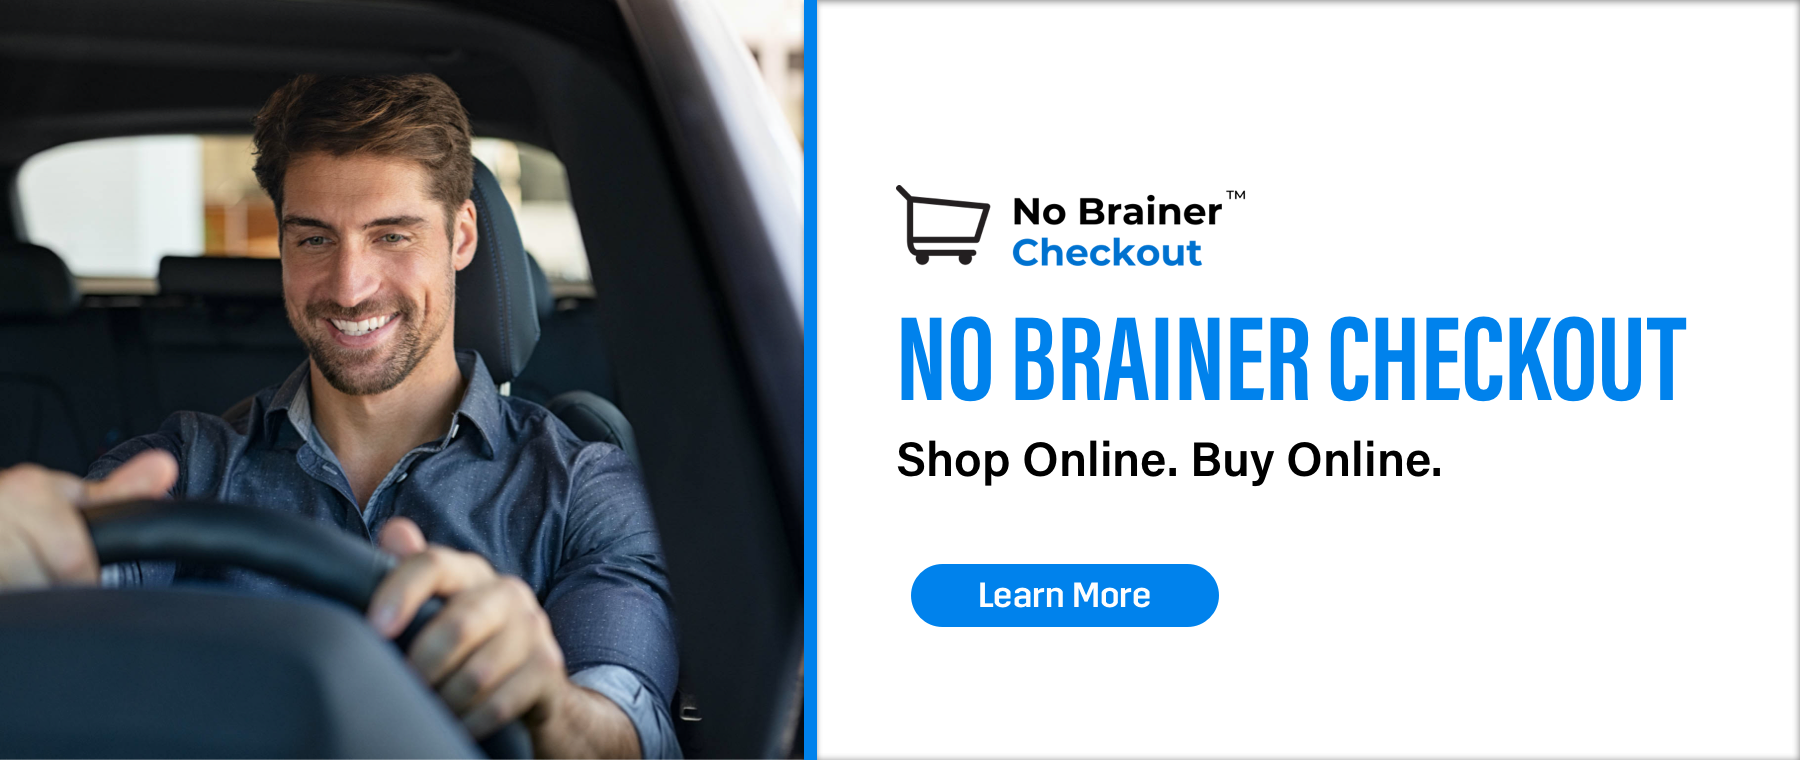 GM No Brainer Checkout 1800×760